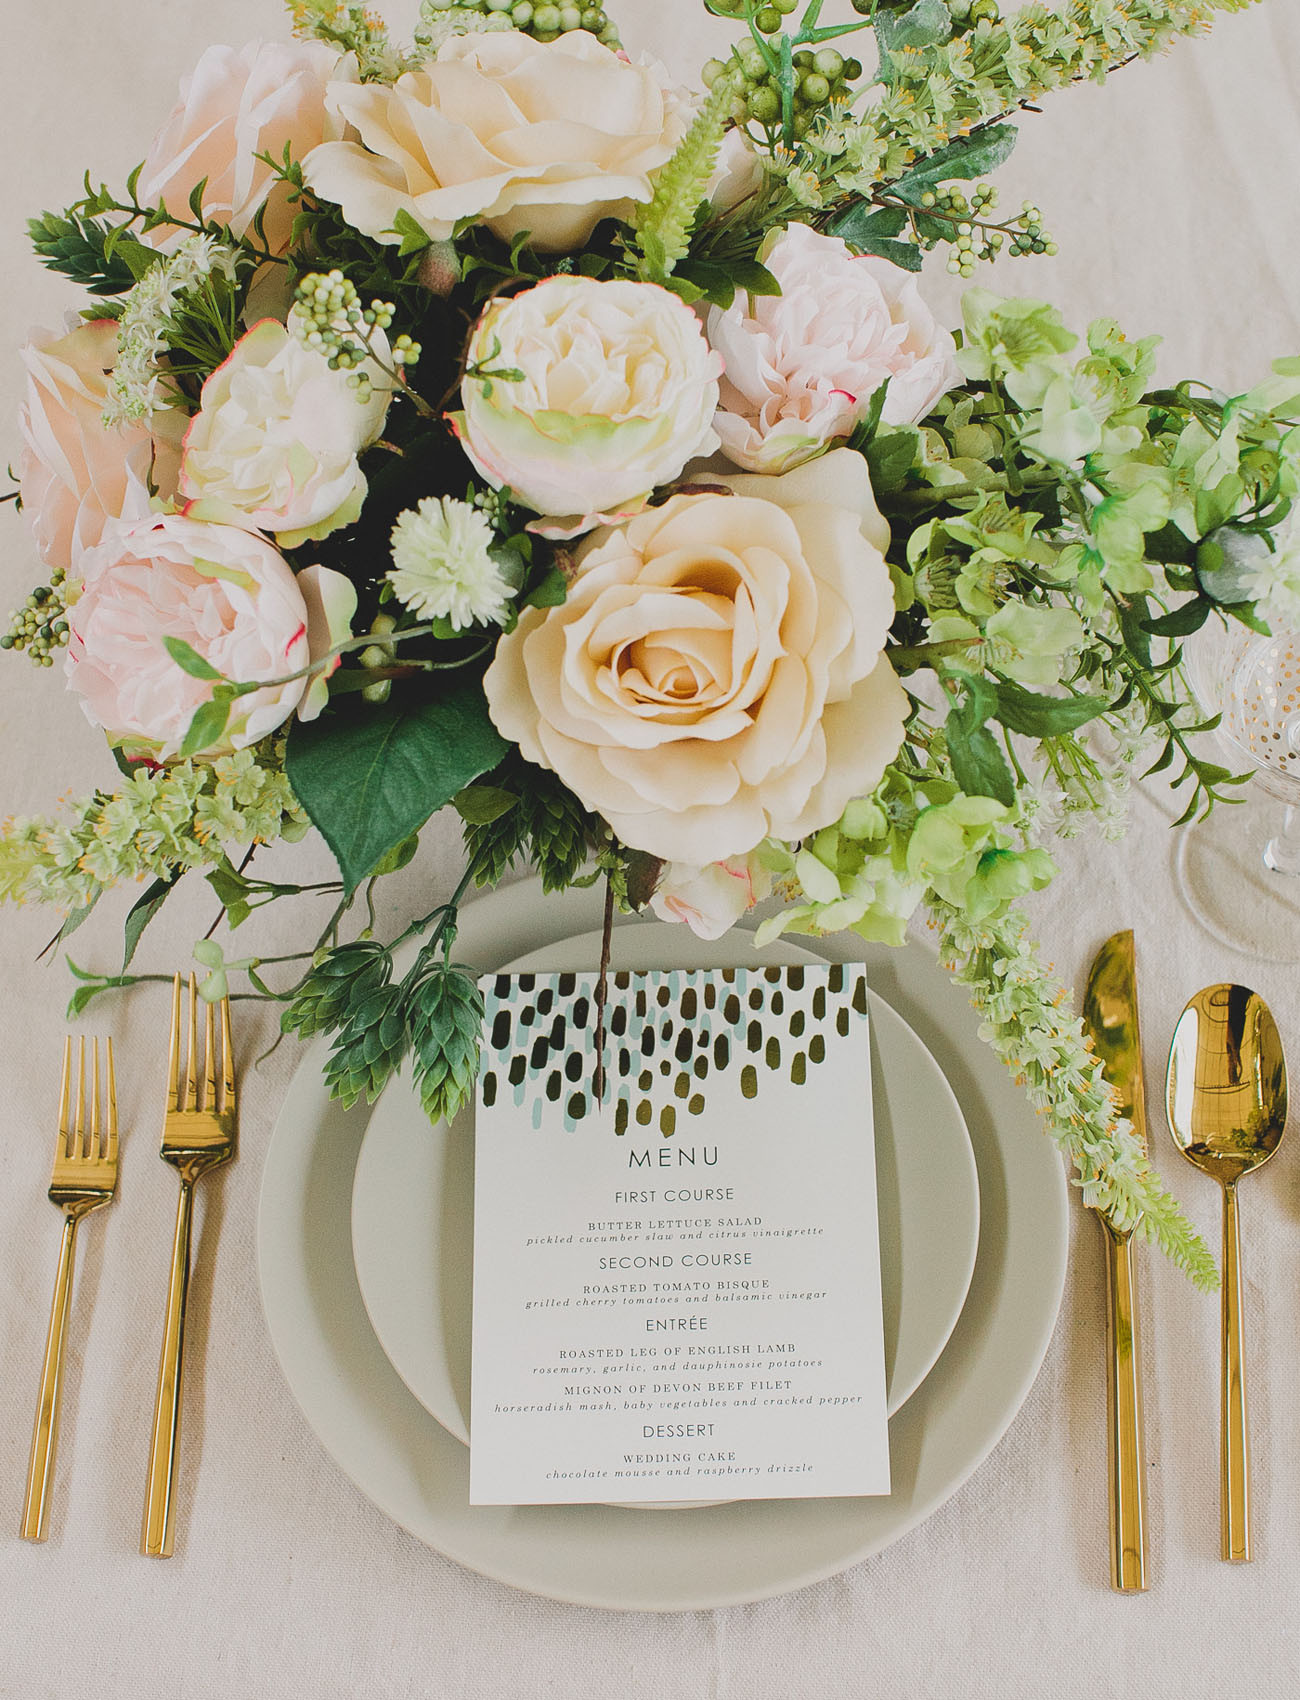 Best ideas about DIY Wedding Floral Centerpieces . Save or Pin DIY Silk Flower Centerpiece Green Wedding Shoes Now.